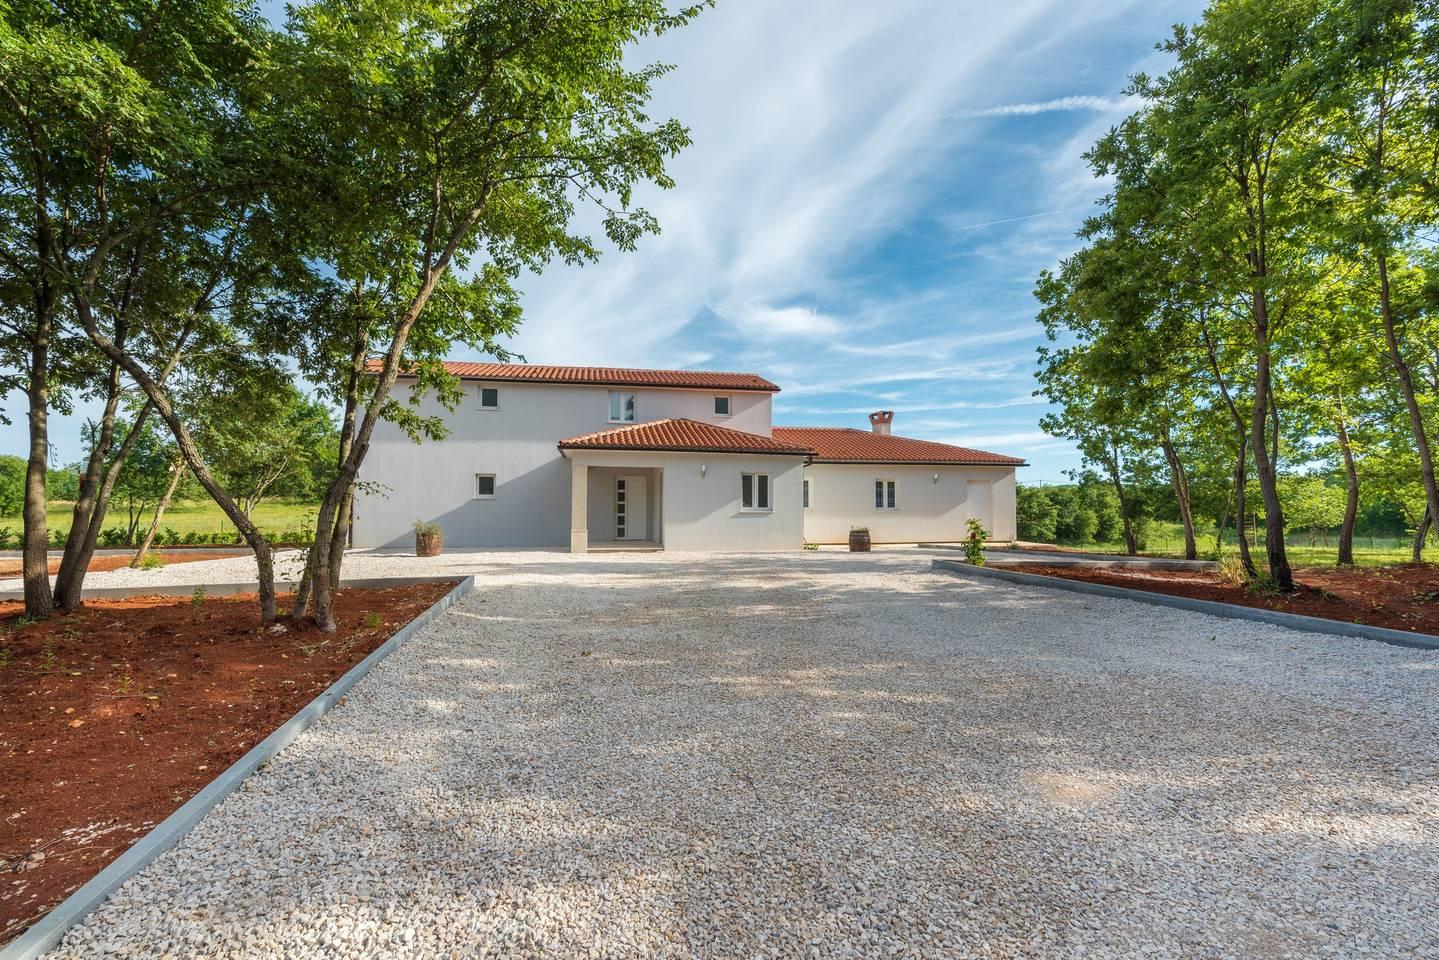 Apartment Private Villa in Sumber near Rabac photo 16629785